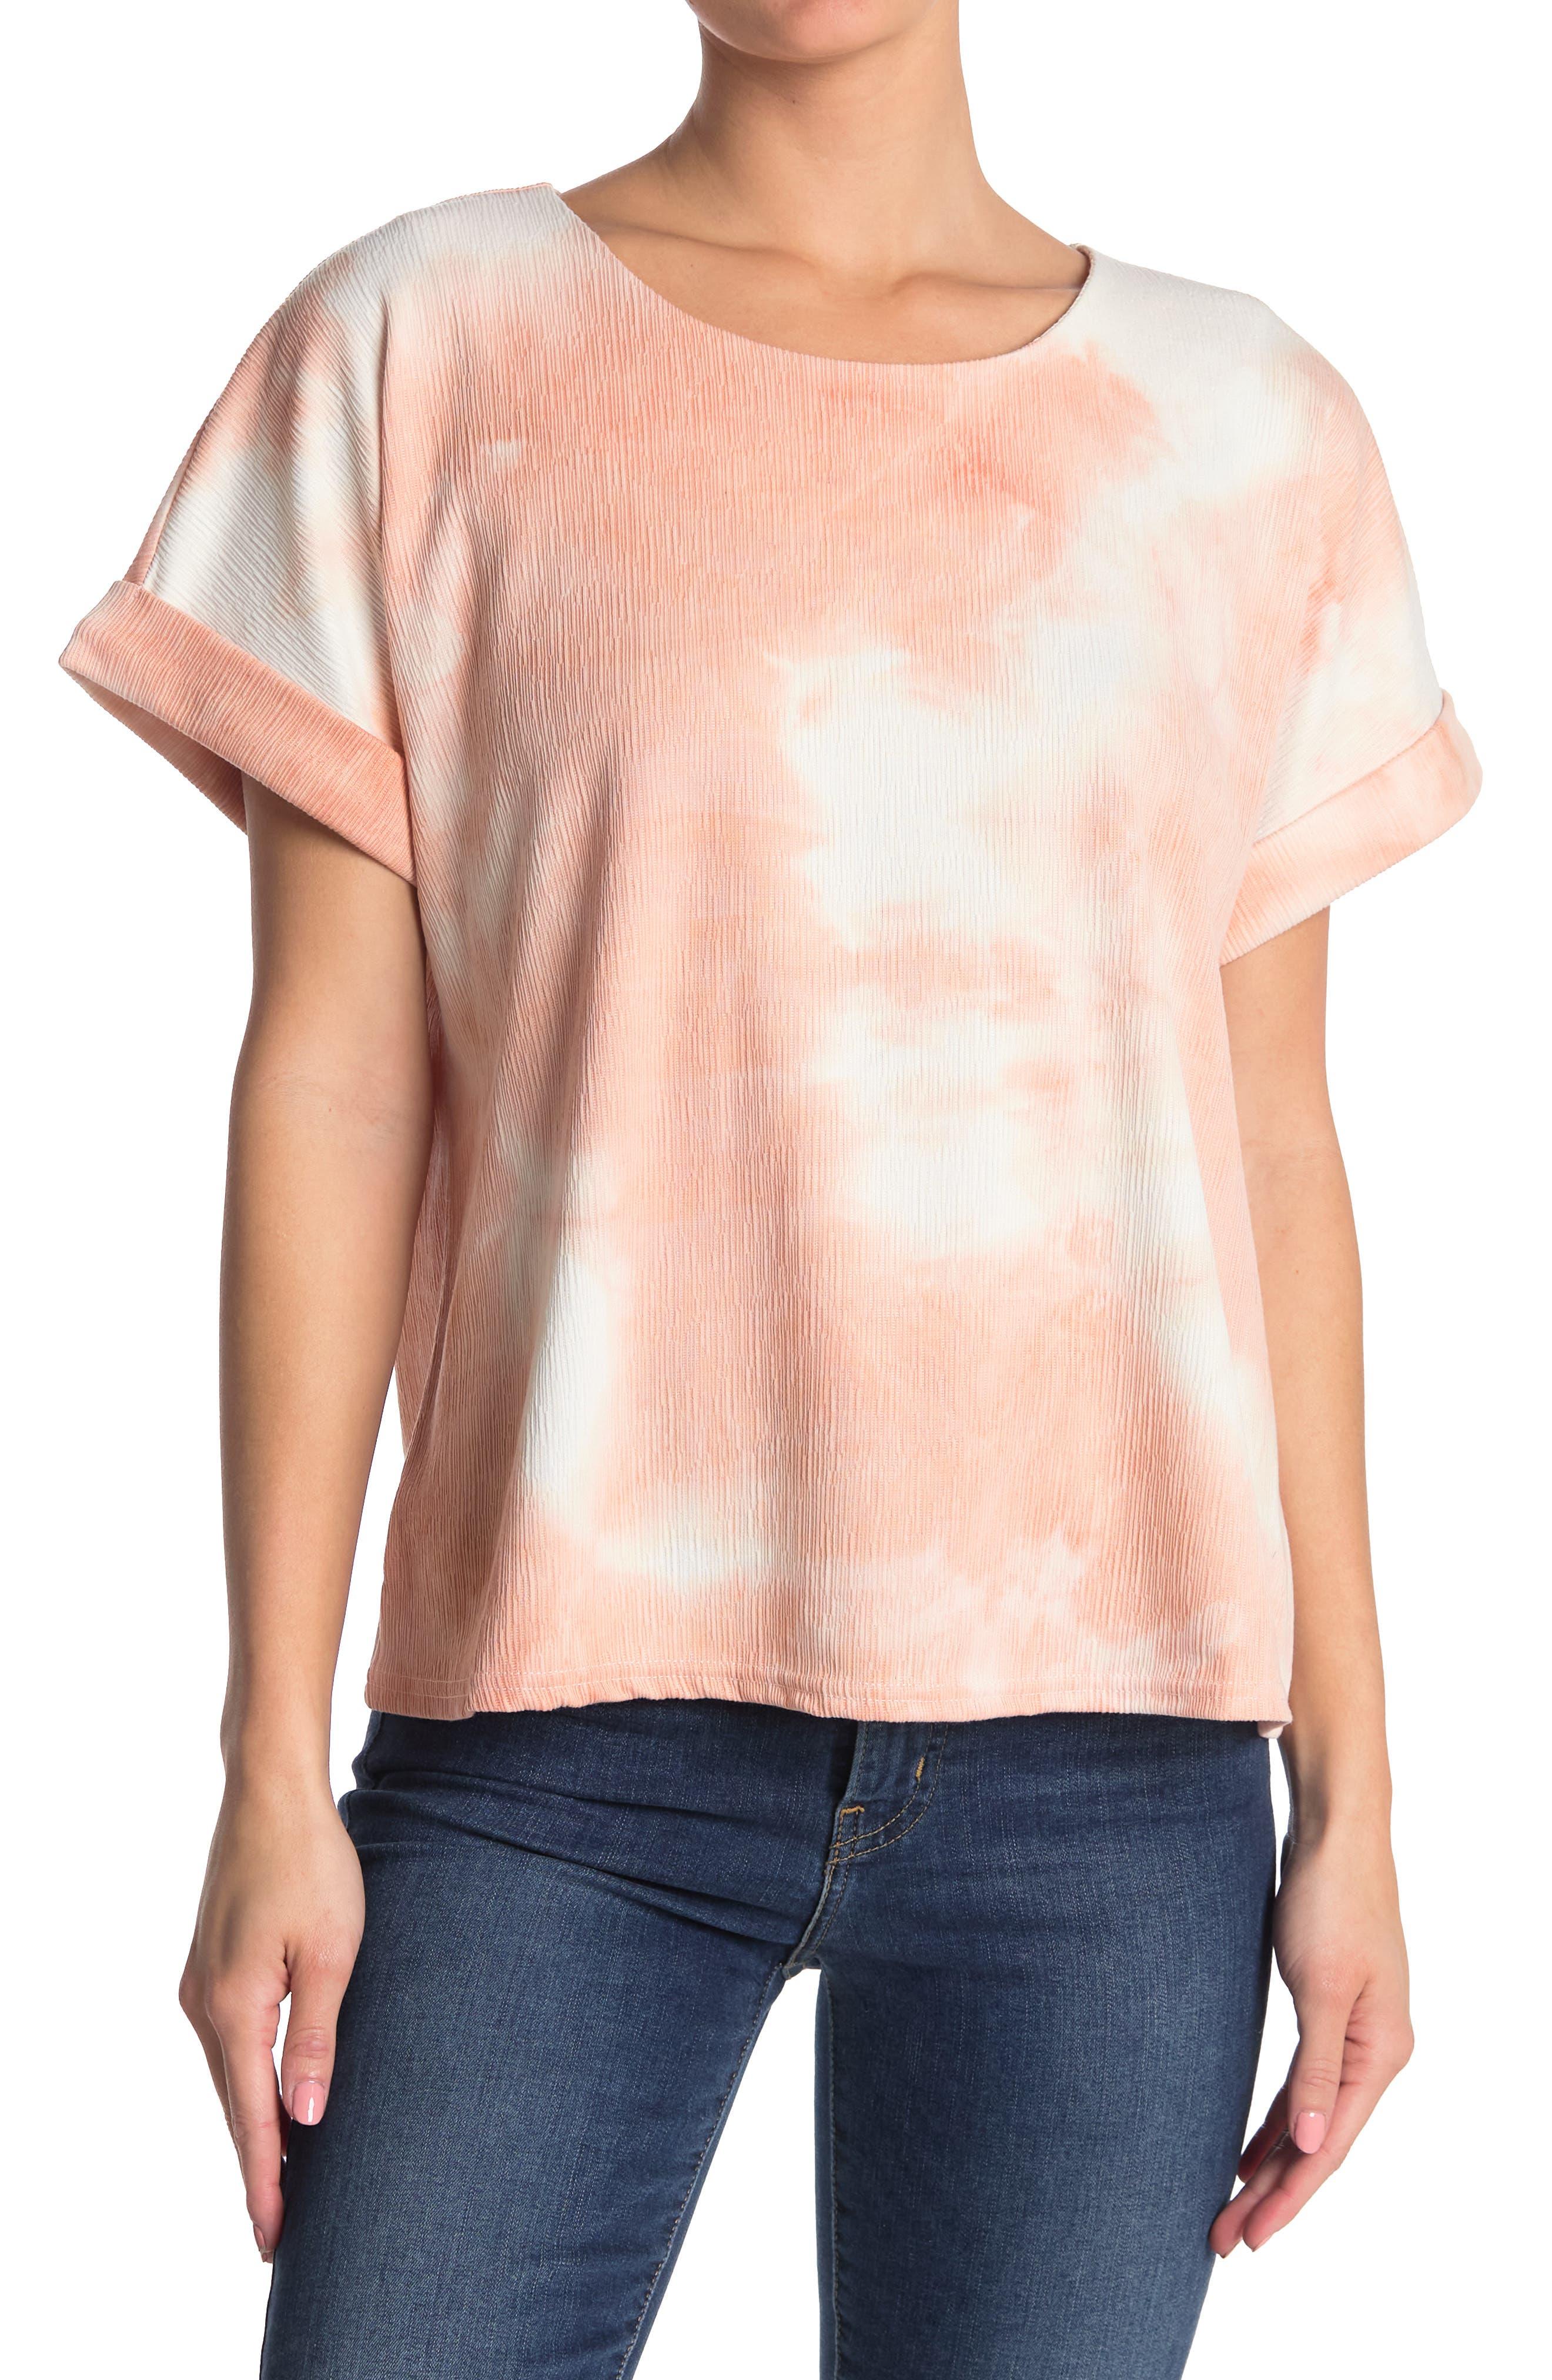 Melloday Textured Short Sleeve Knit Shirt In Dark Red7